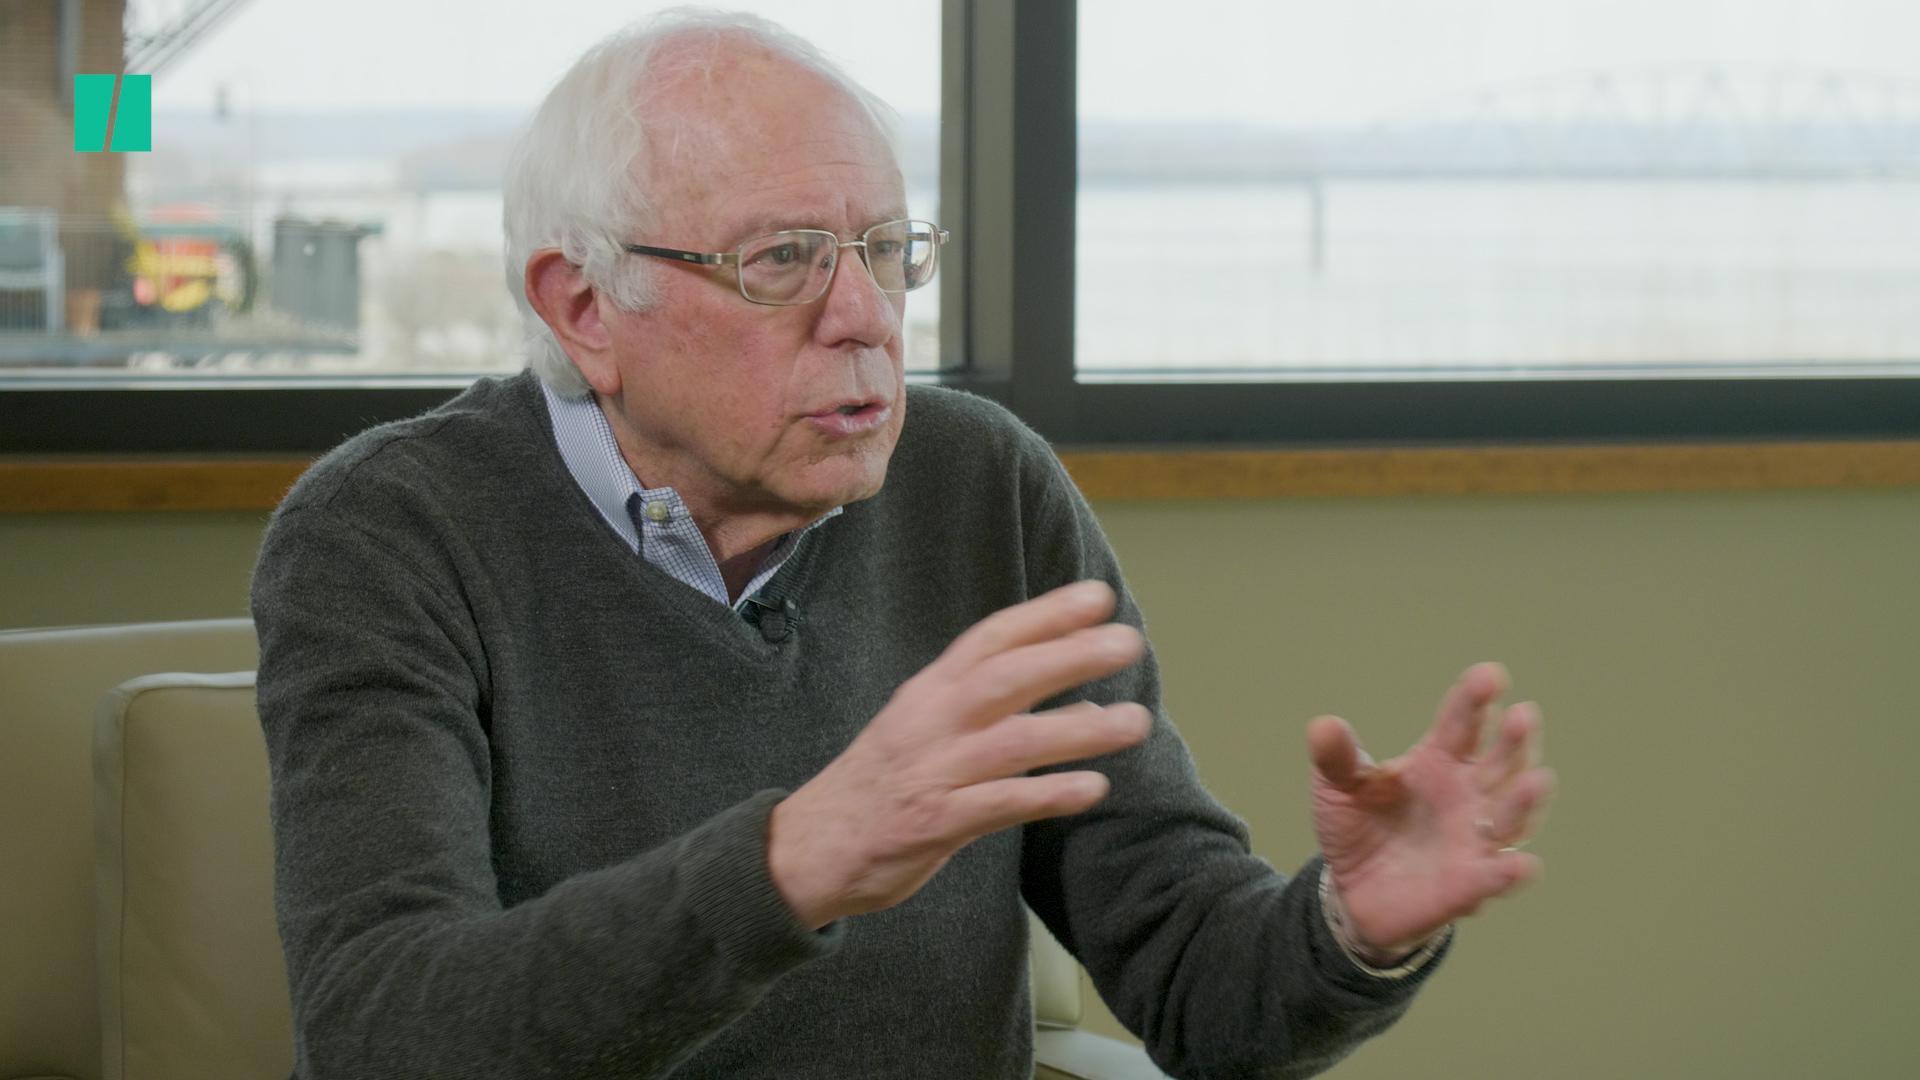 Bernie Sanders Tells Fox News Viewers That Trump Is A 'Pathological Liar'